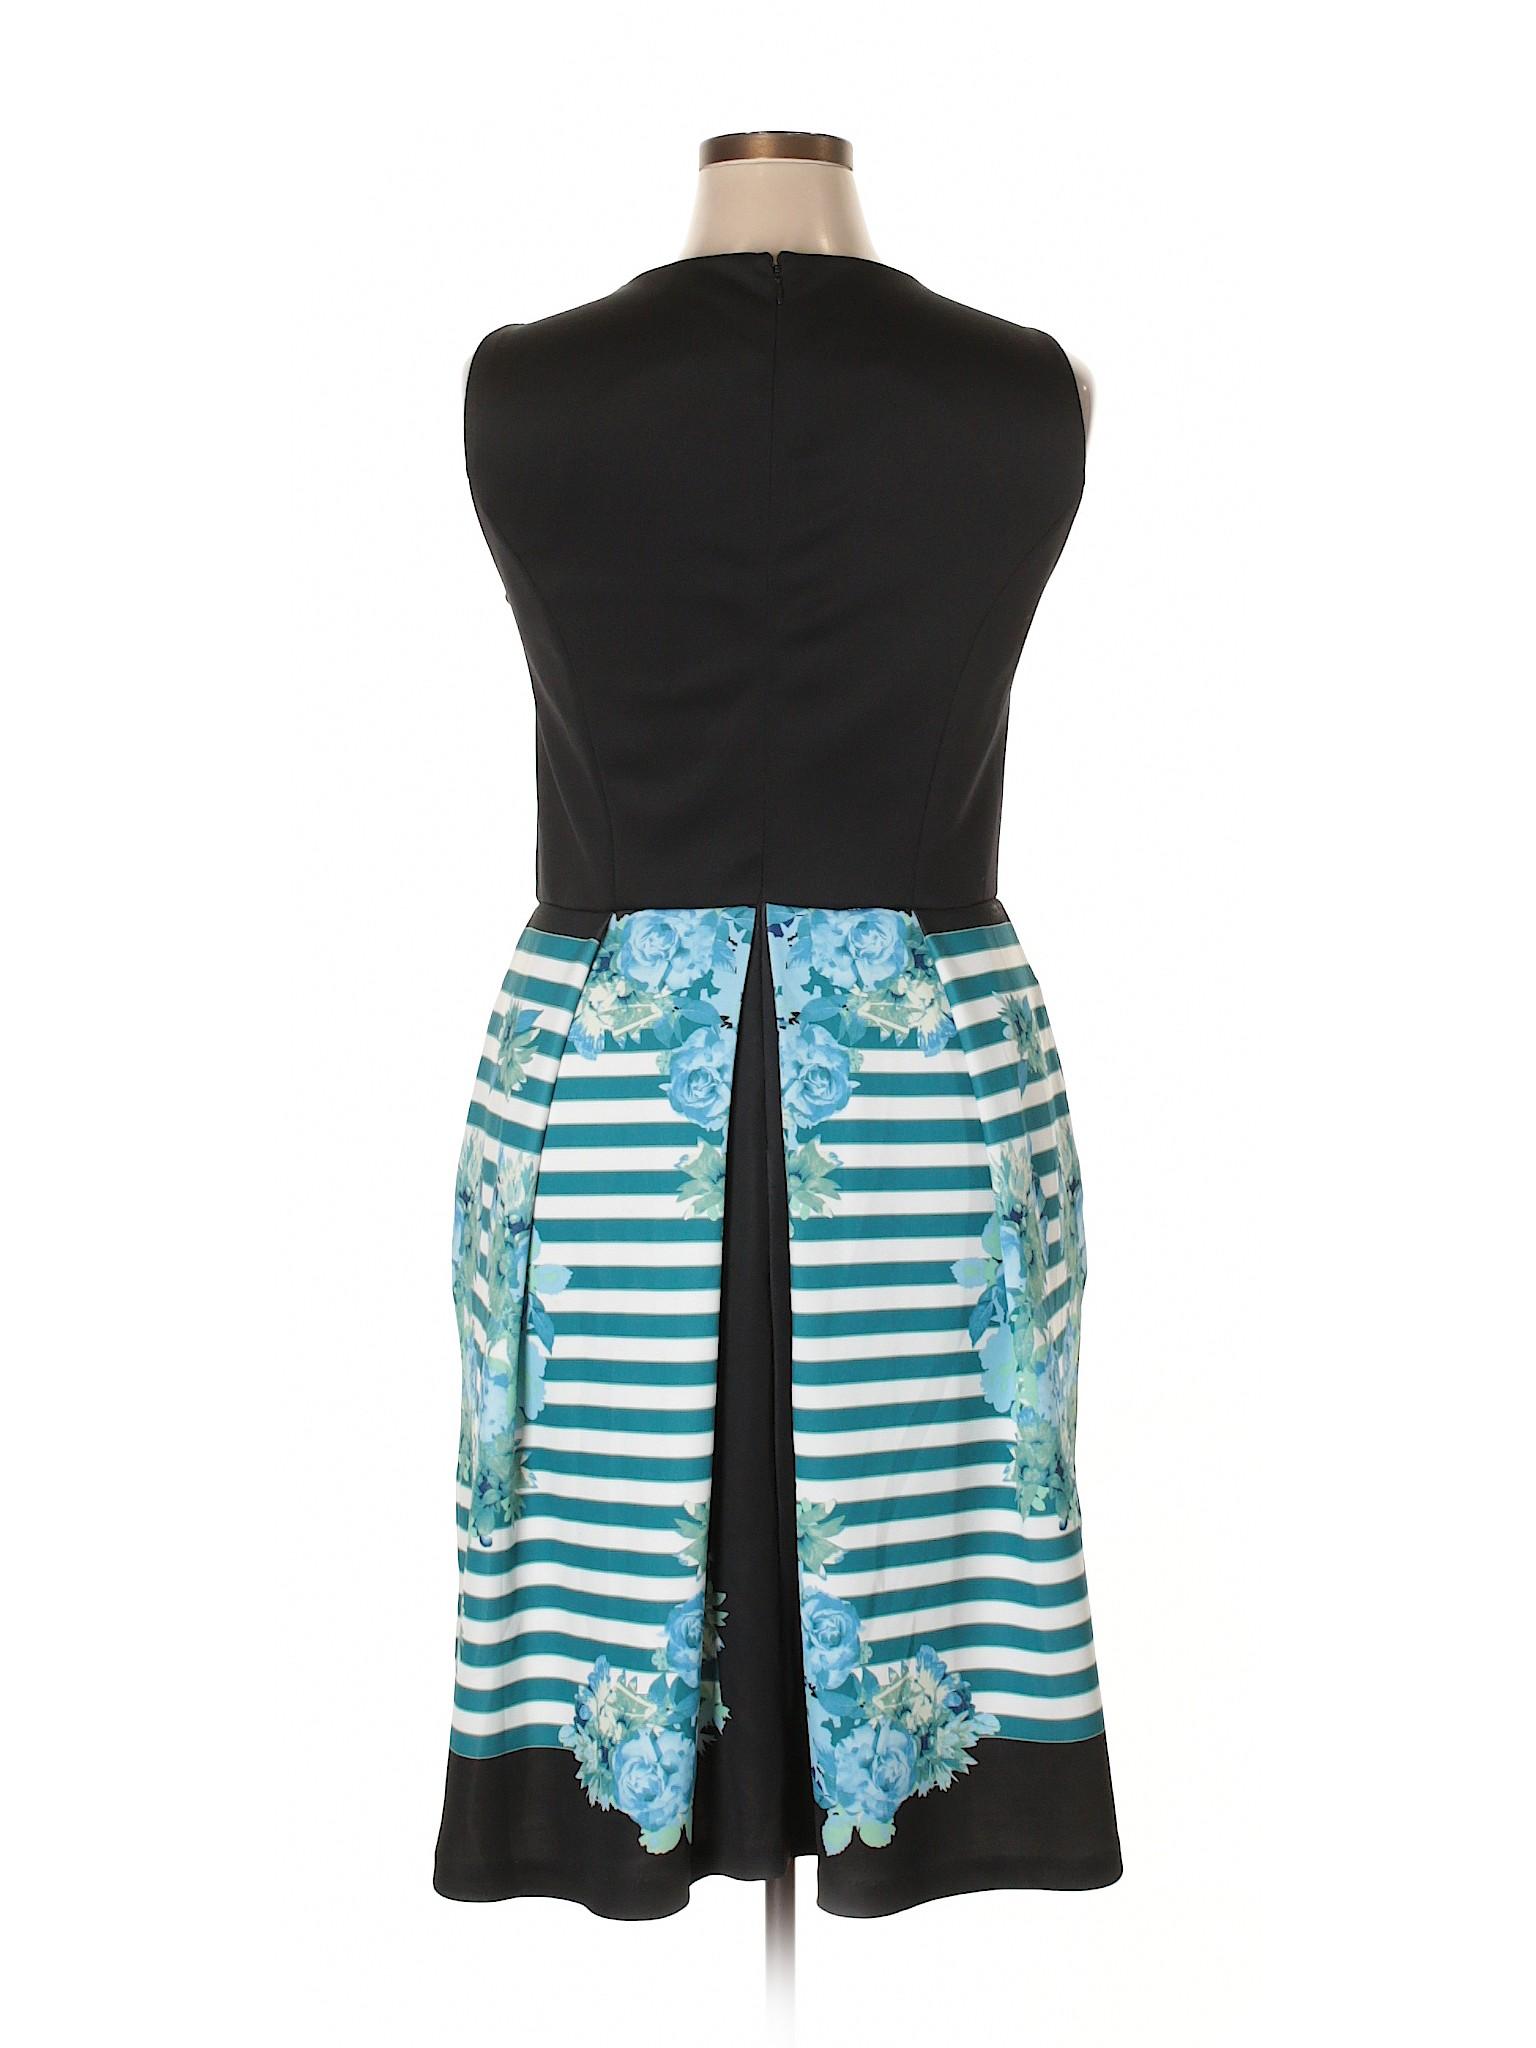 Company amp; Casual Selling Dress York New tRTqEwAE6x